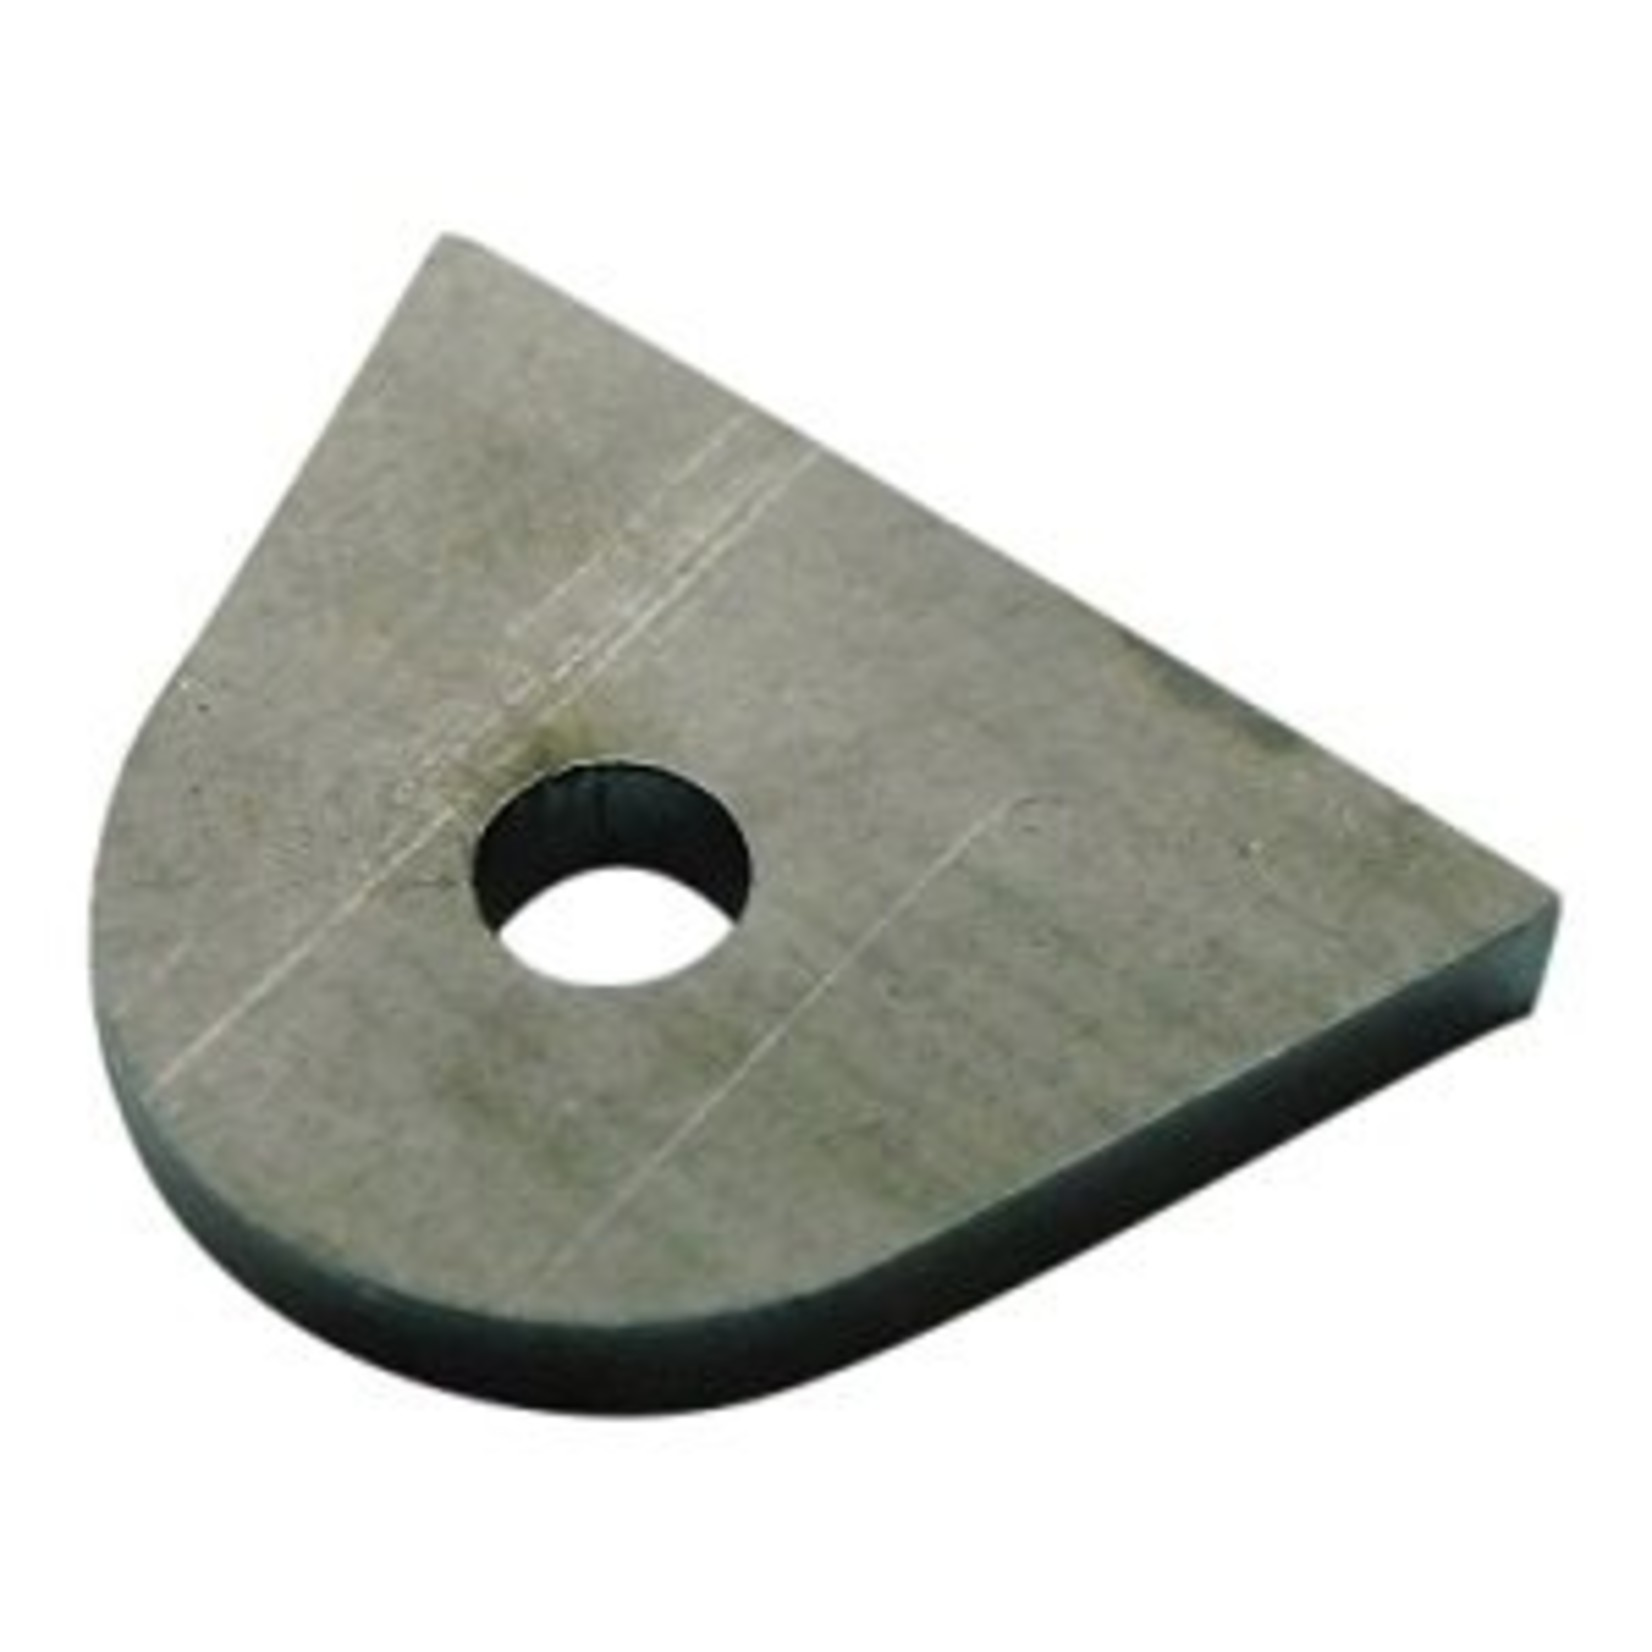 Staal las strip - Remanker 3/8 - 9,5mm